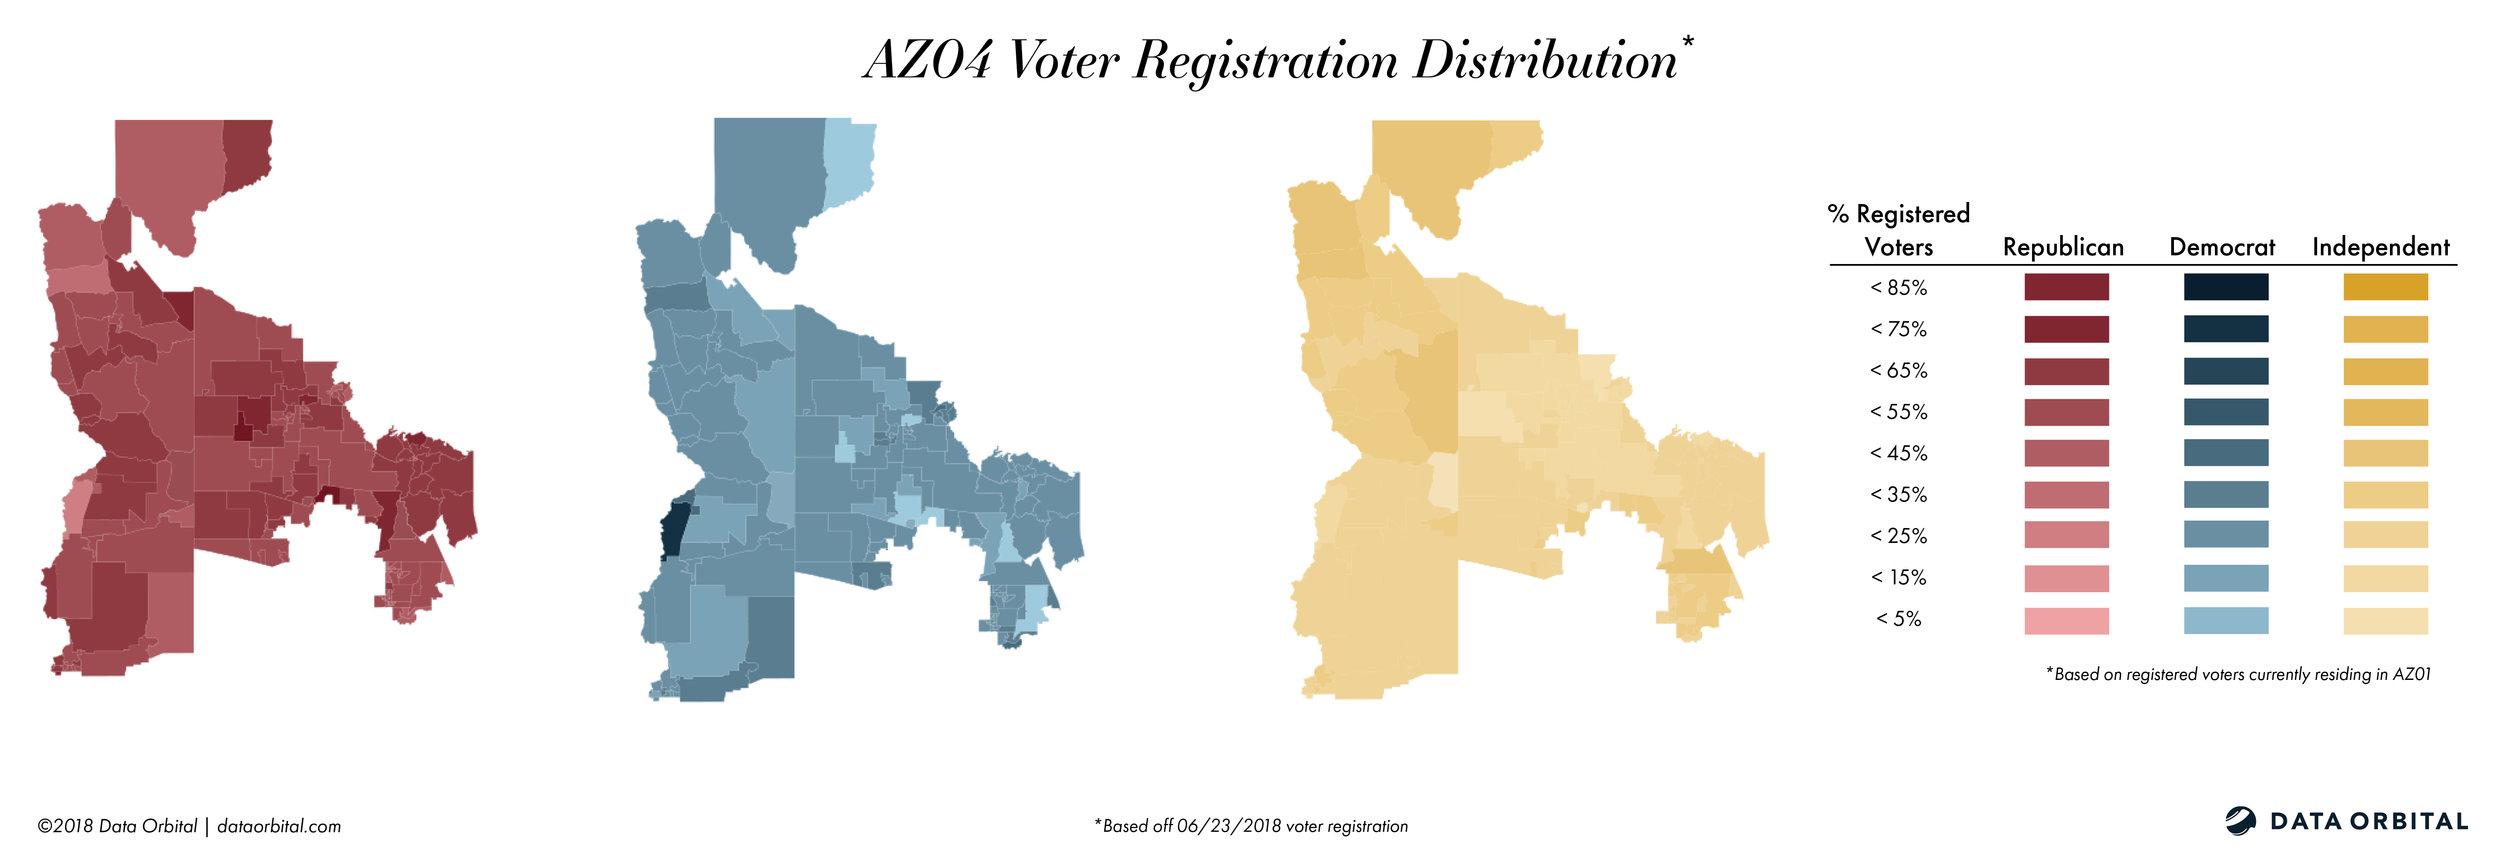 AZ04_VoterBreakdown_Precinct.jpg